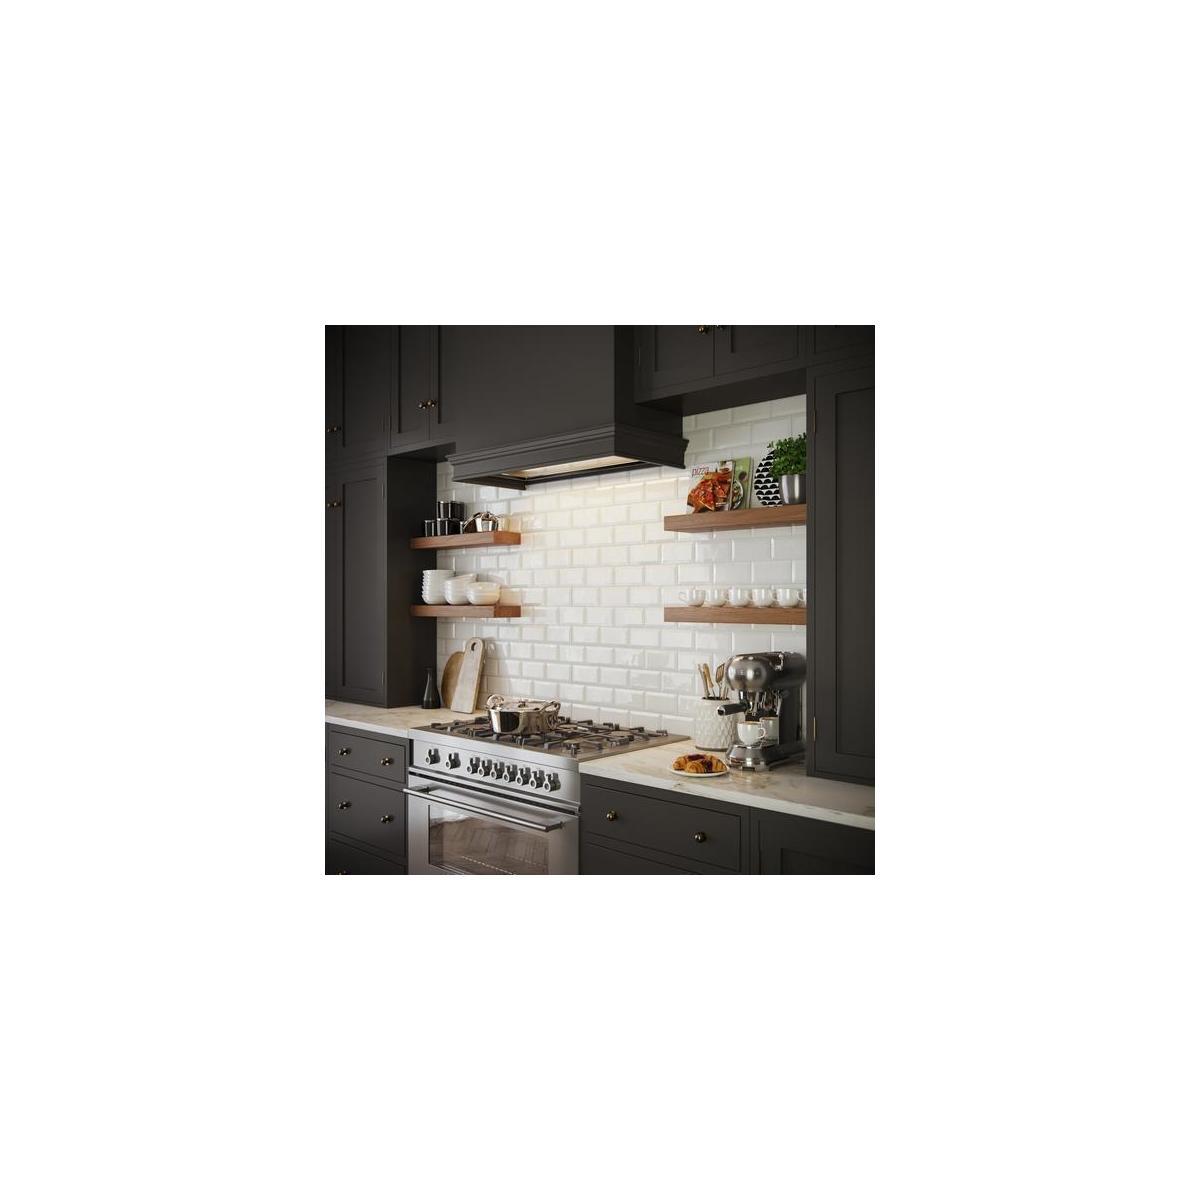 Rustic Wood Floating Shelves Wall Mounted - 2